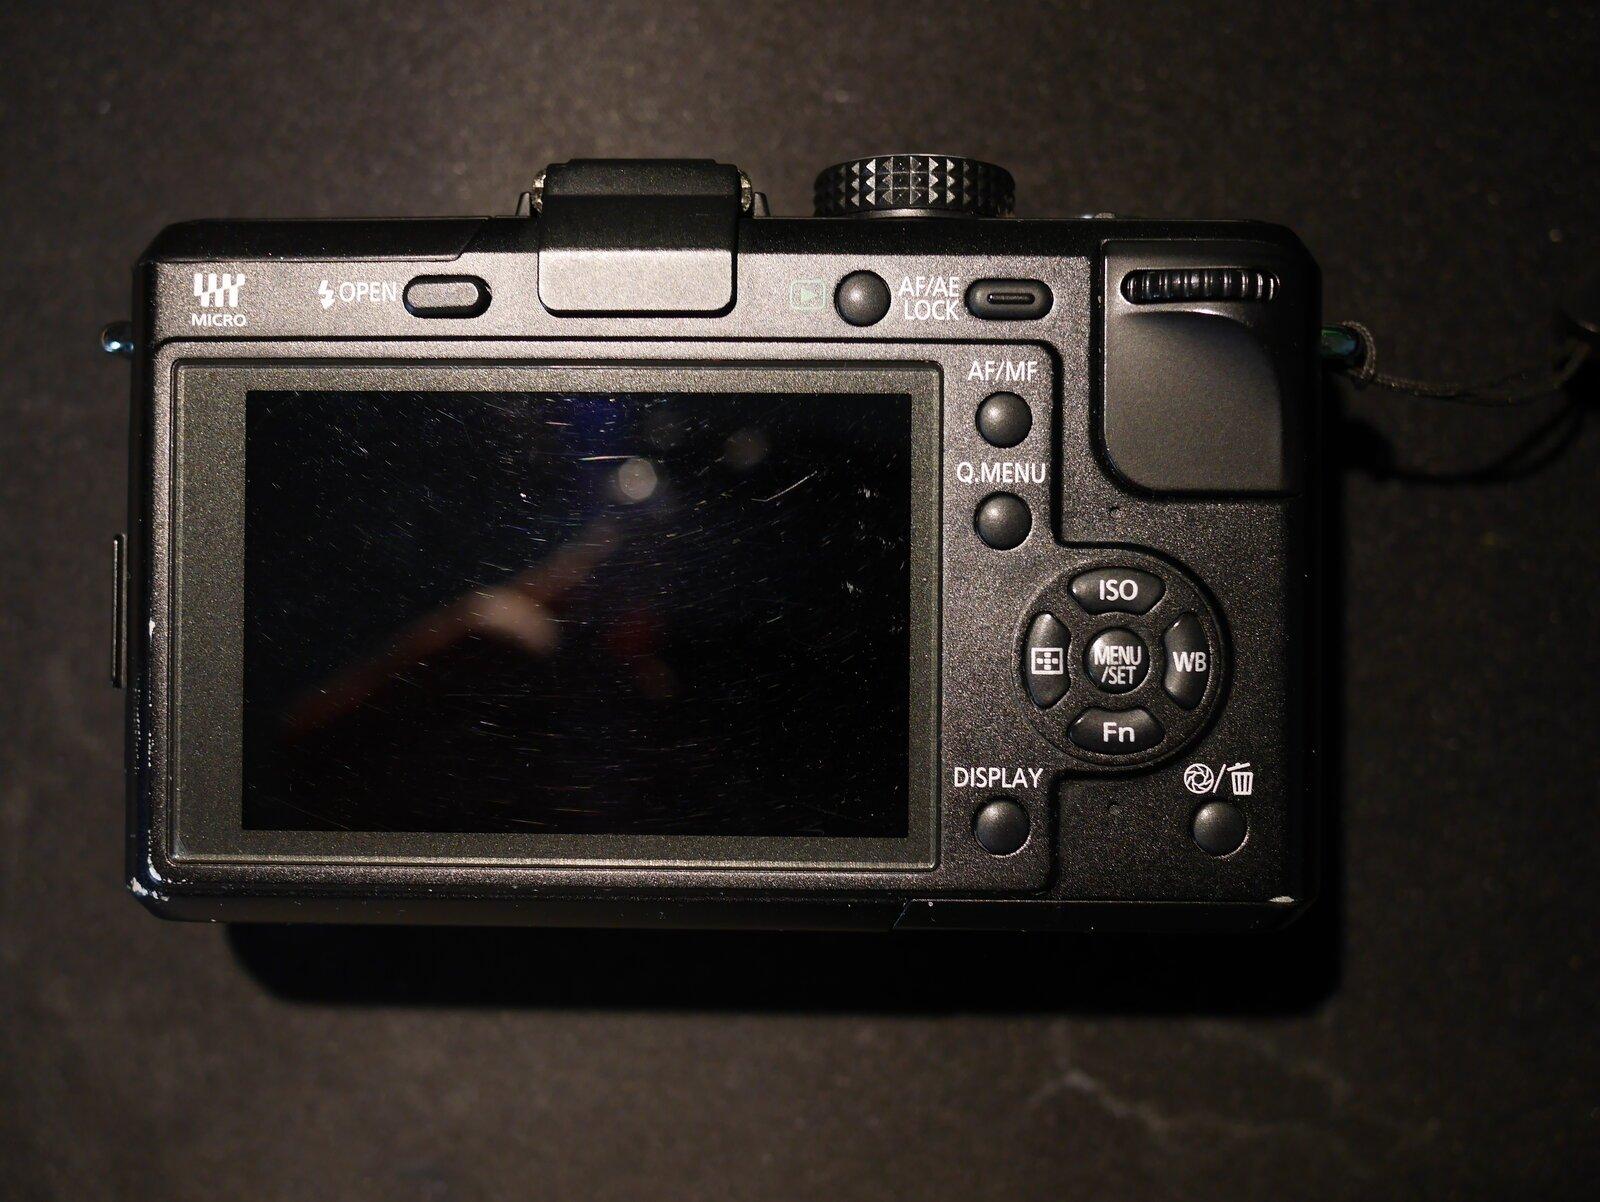 P1190321.JPG